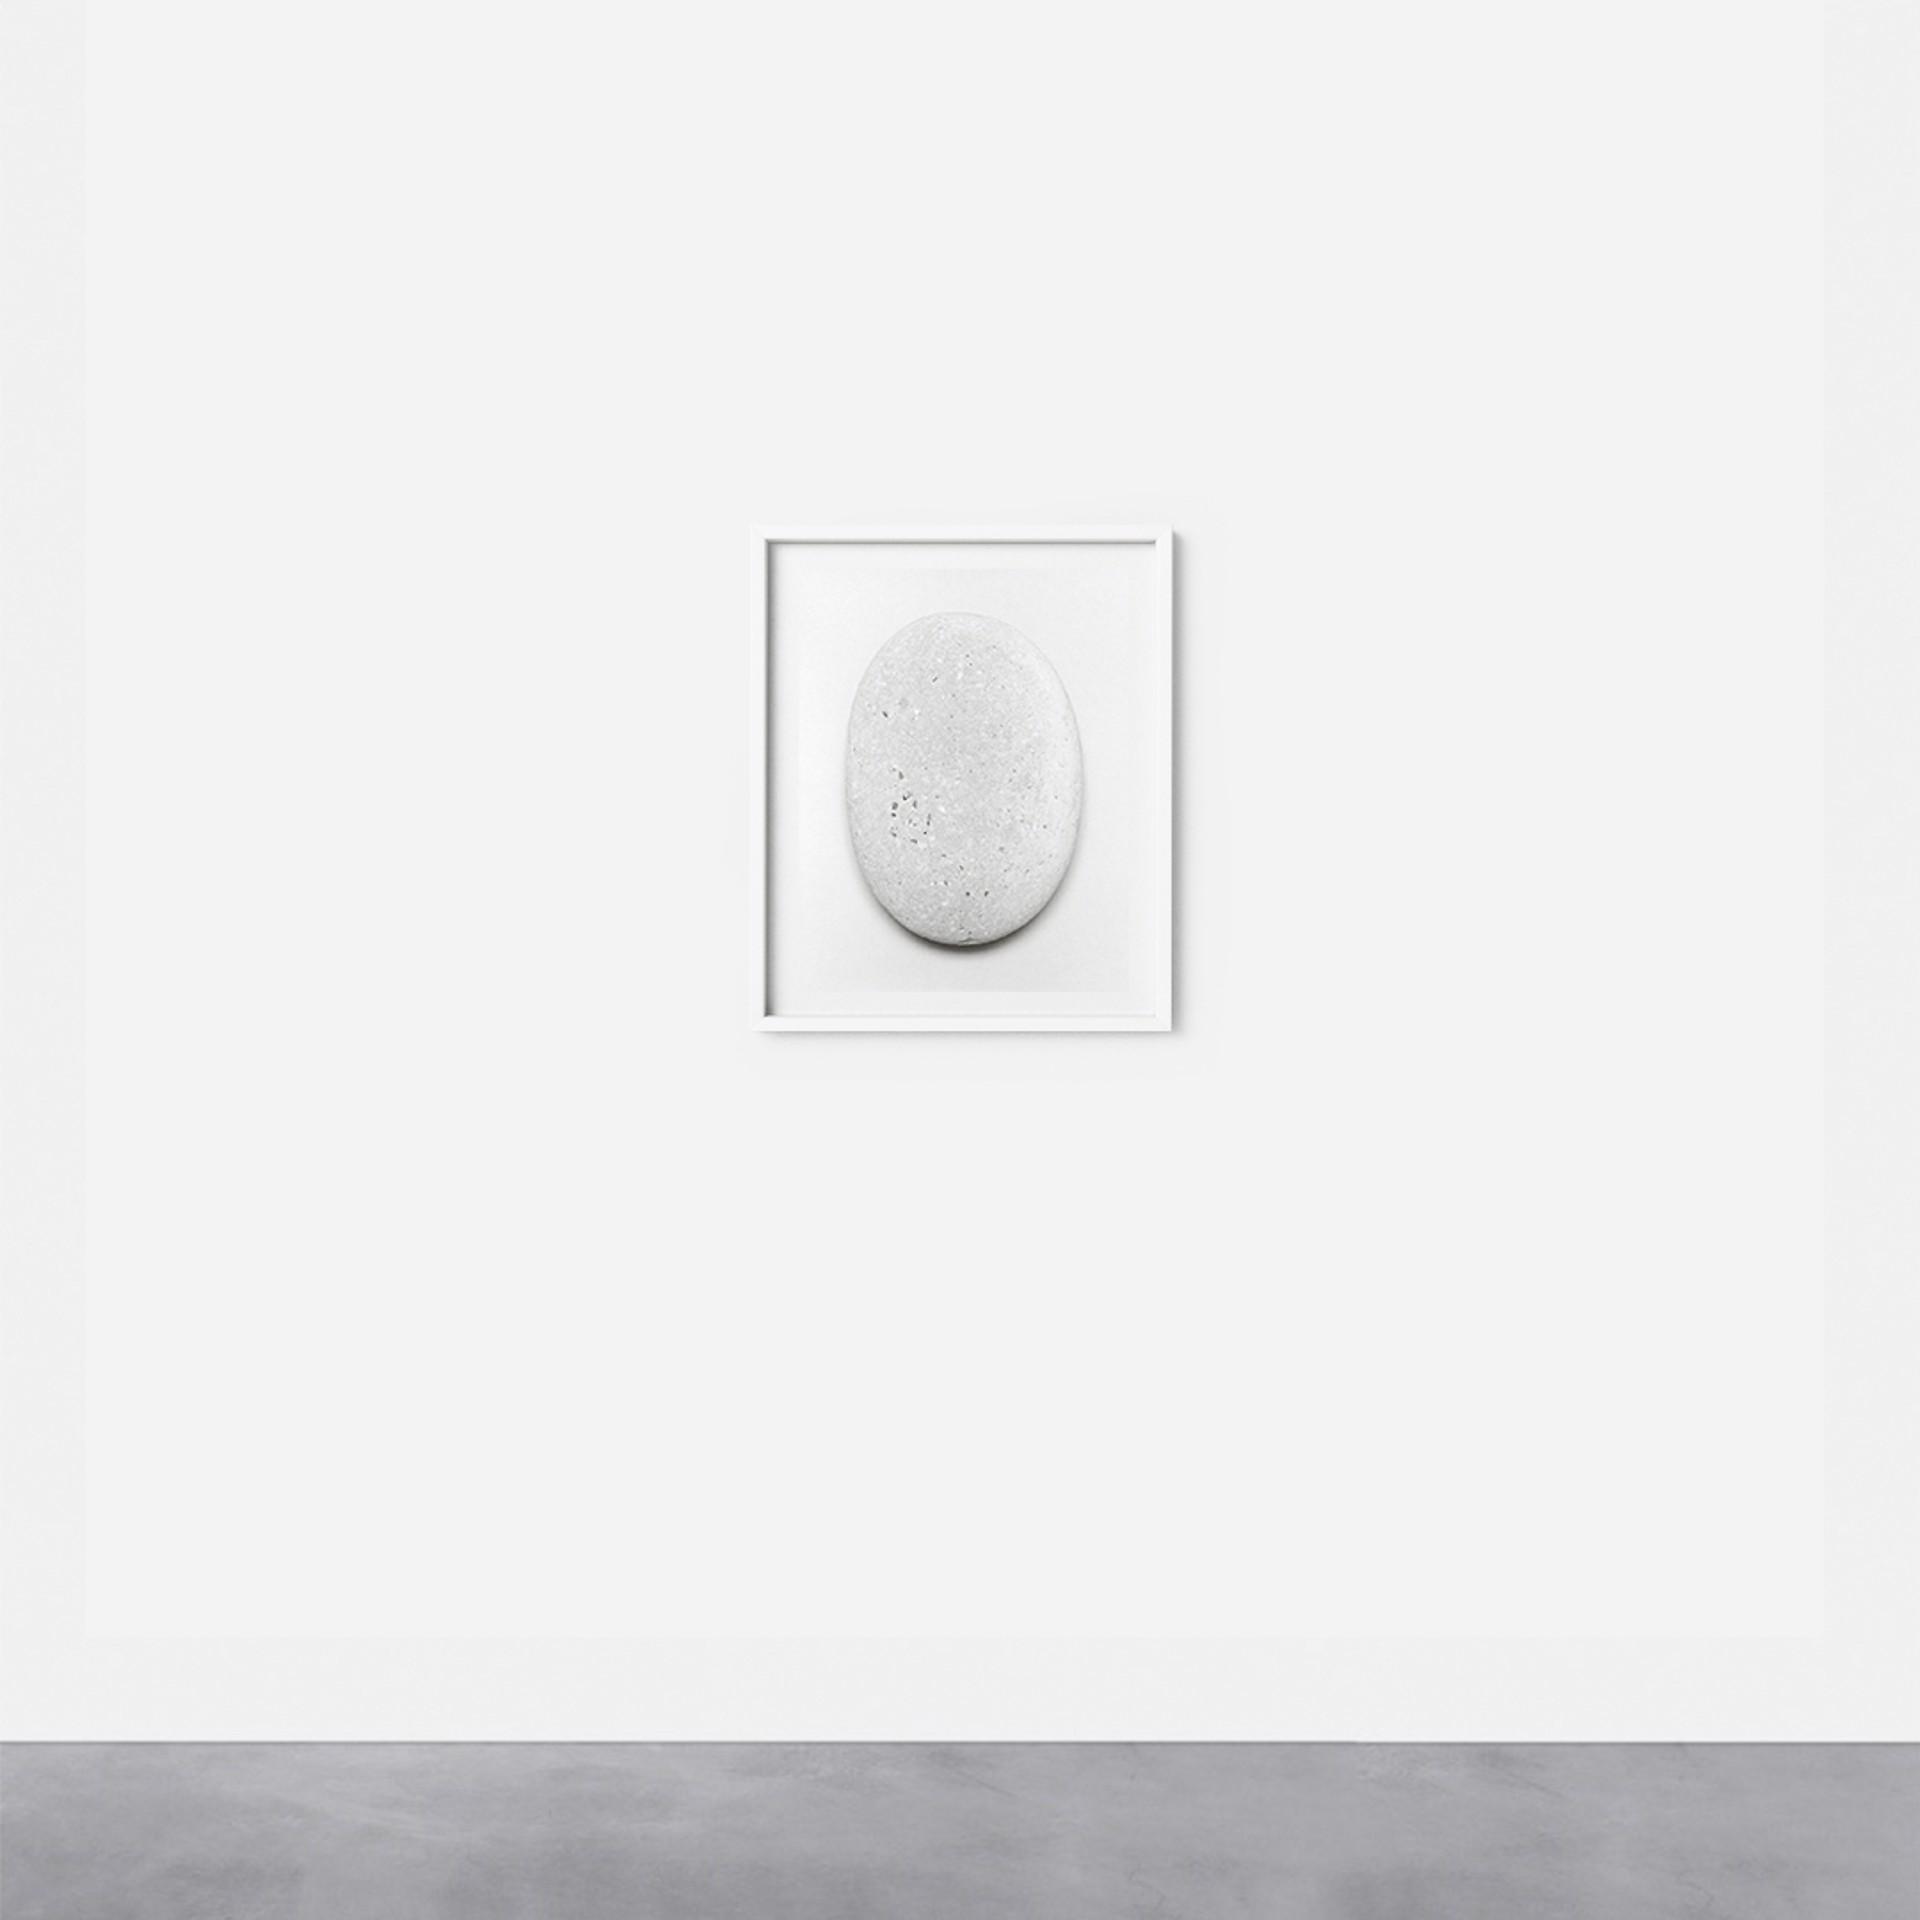 Luminous stone #14 by Gabriella Imperatori-Penn